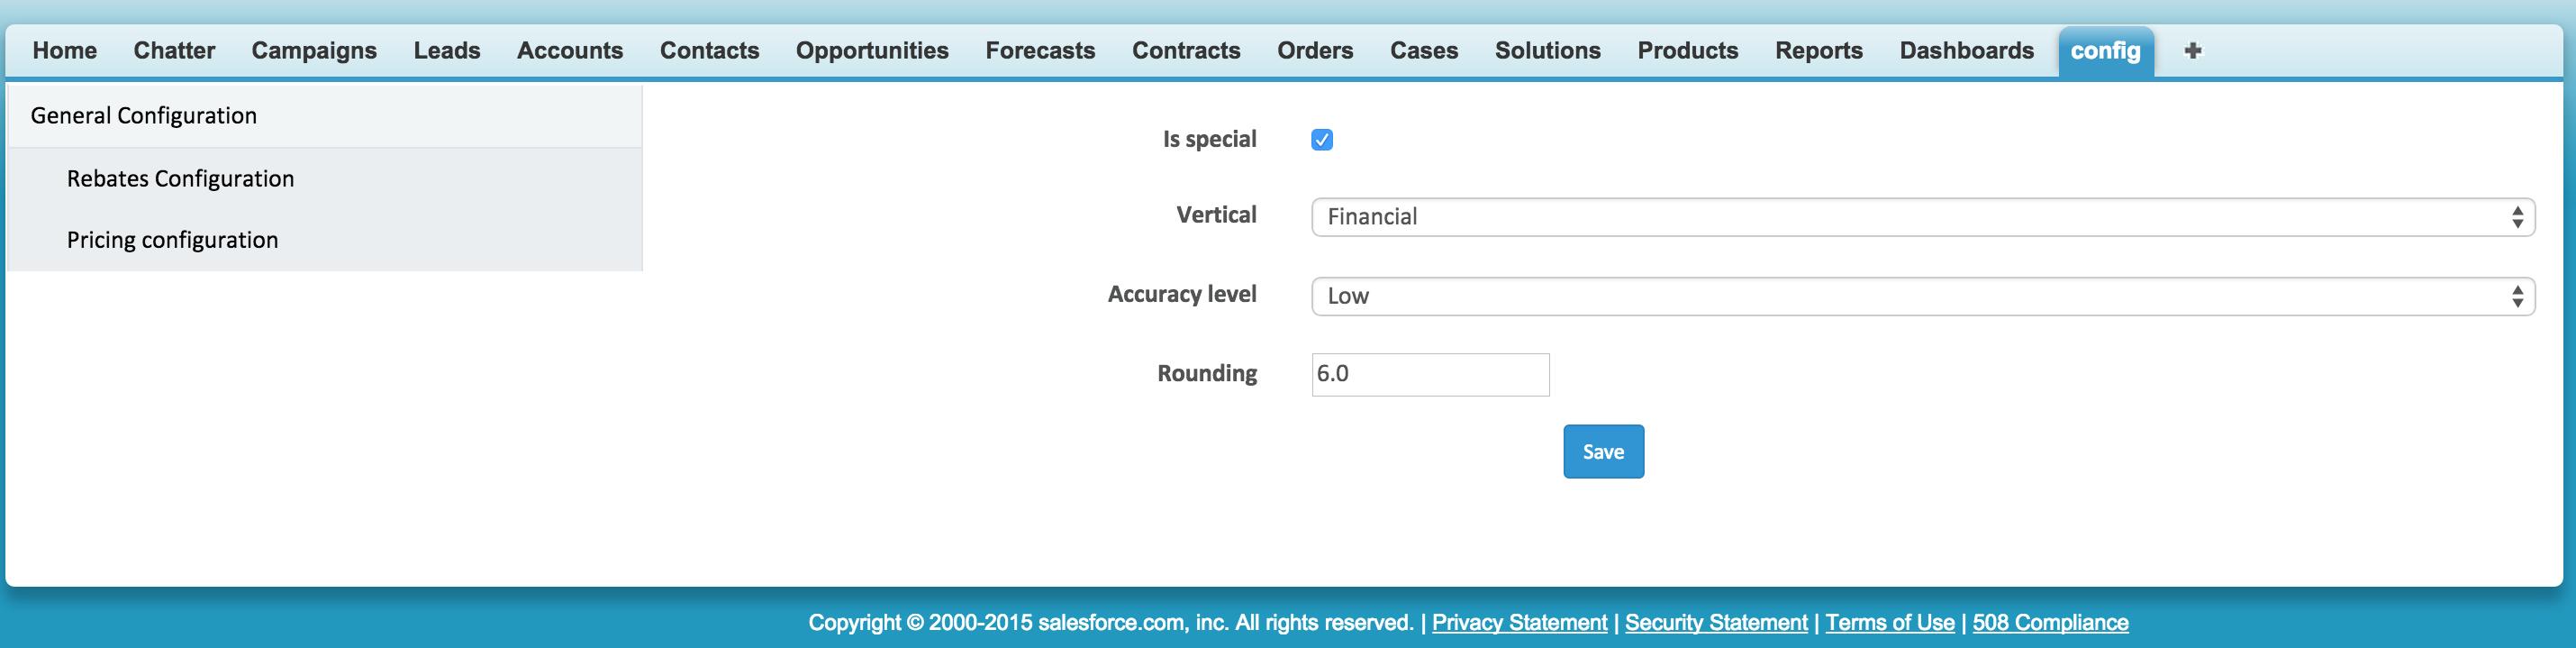 MConfiguration App Demo Screenshot